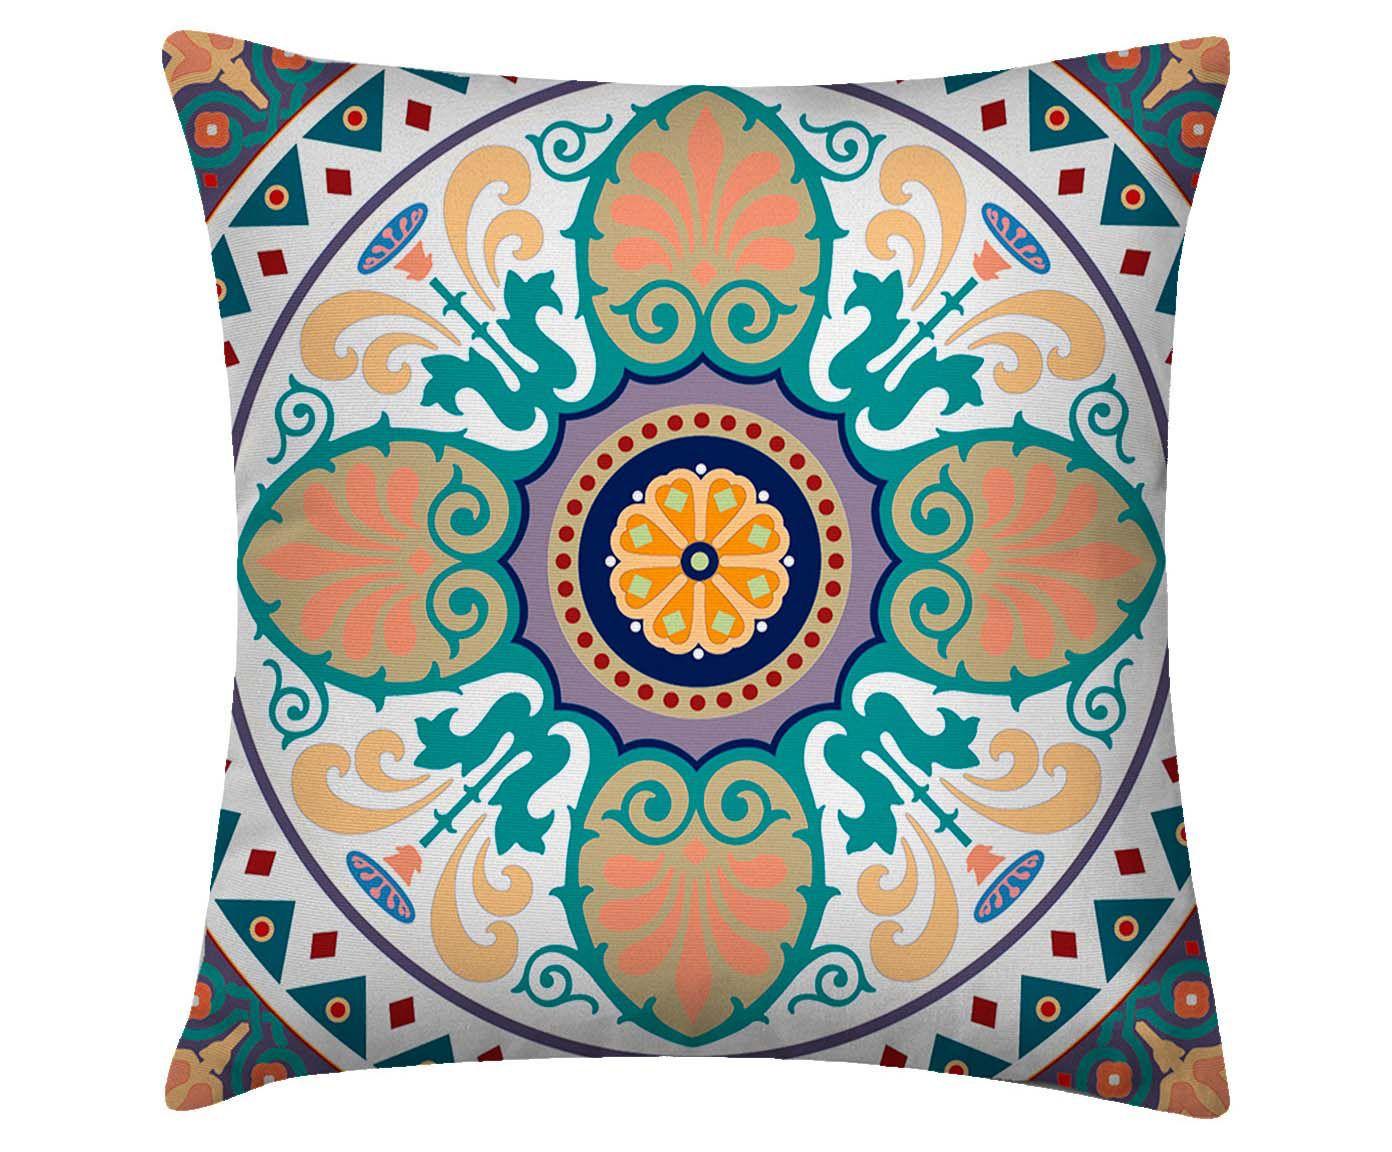 Capa para almofada styl colors - 40x40cm | Westwing.com.br